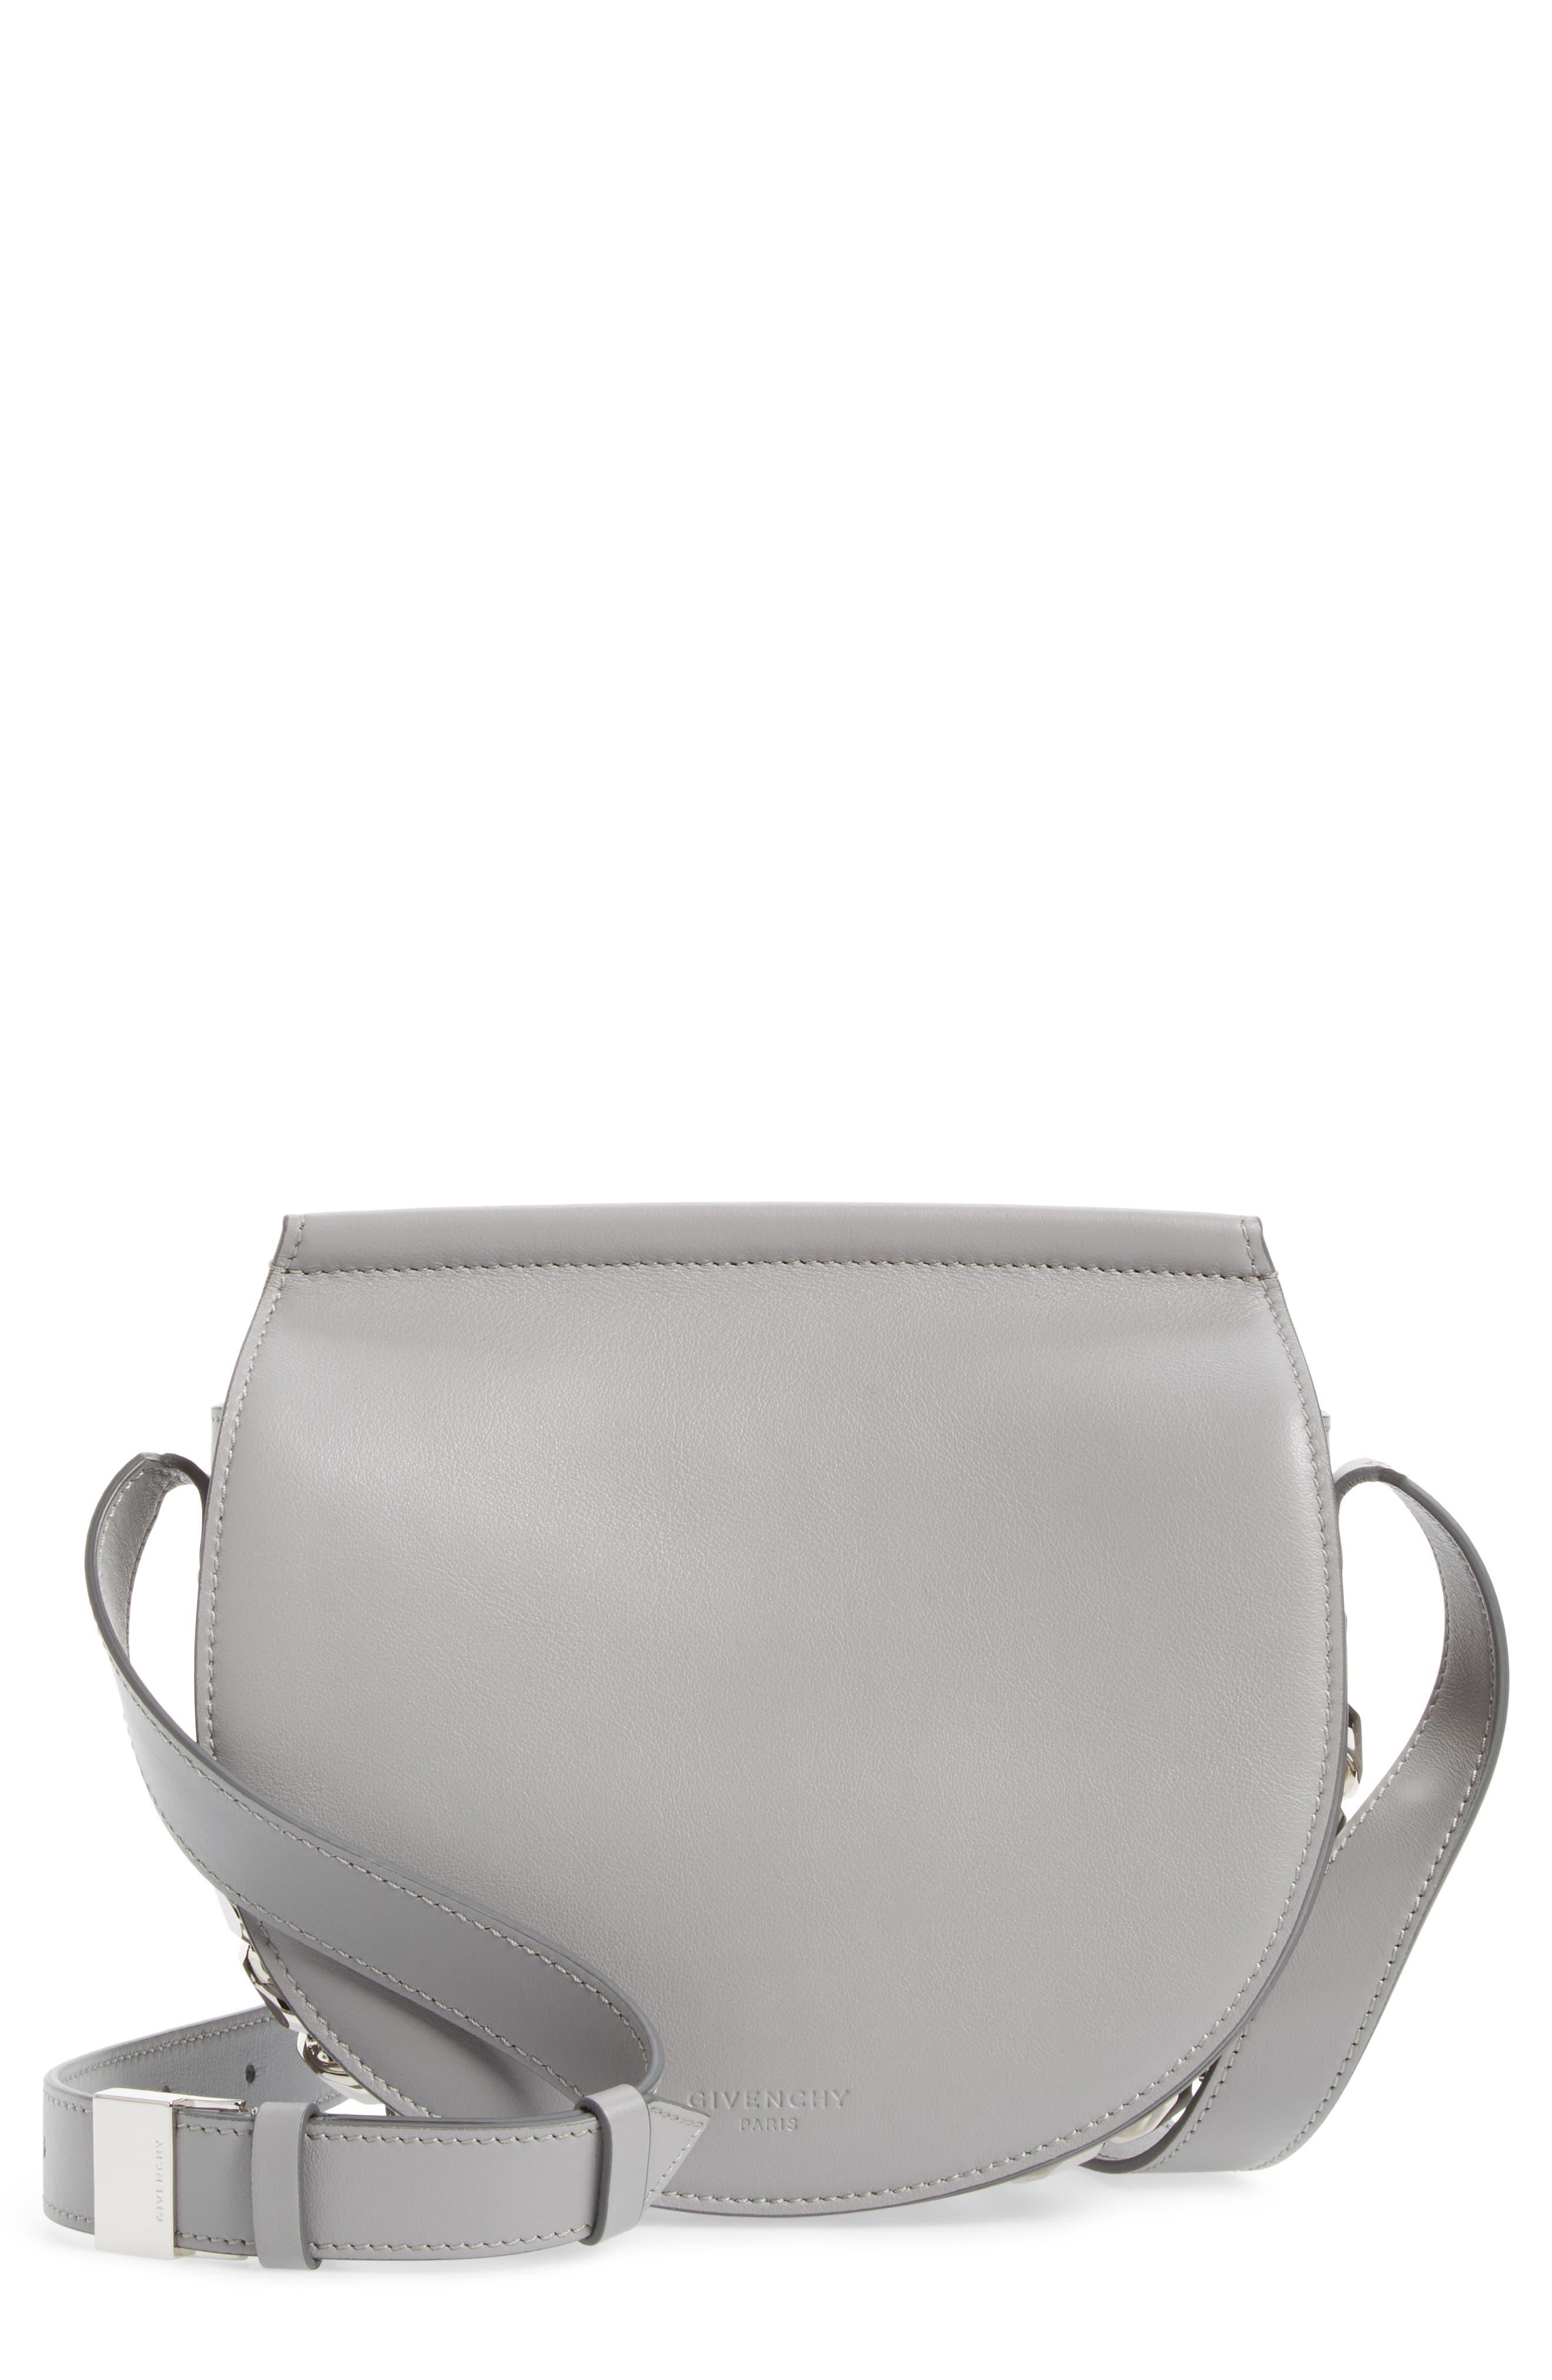 Alternate Image 1 Selected - Givenchy Mini Infinity Calfskin Leather Saddle Bag